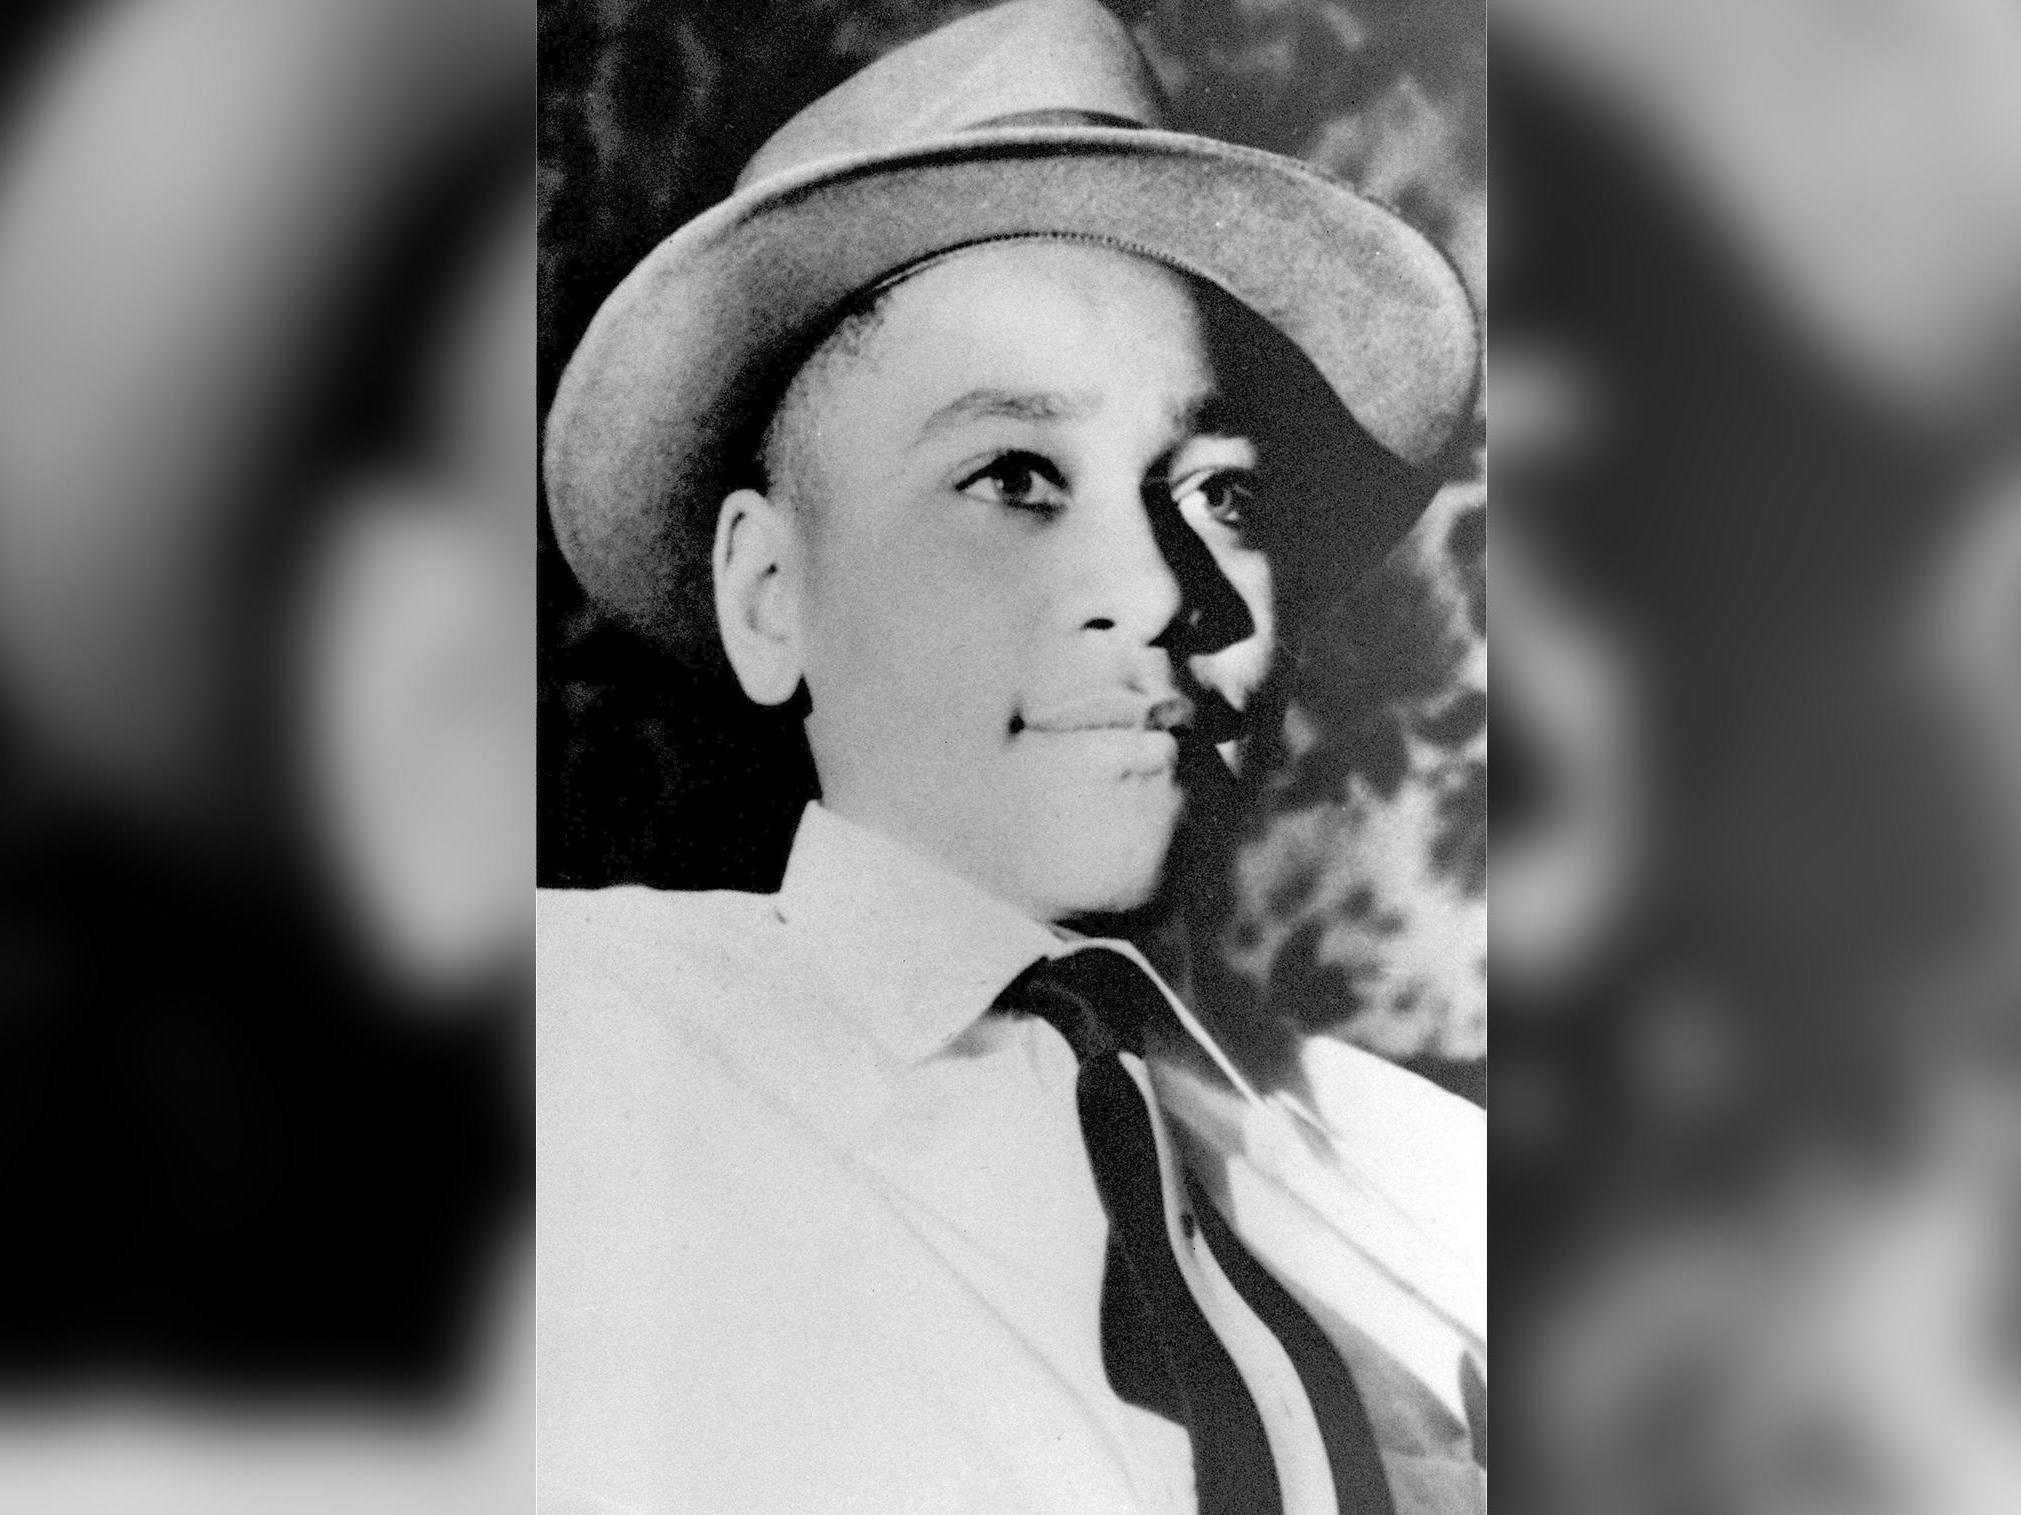 Emmett Till: Bulletproof memorial to murdered black teenager unveiled after repeated vandalism